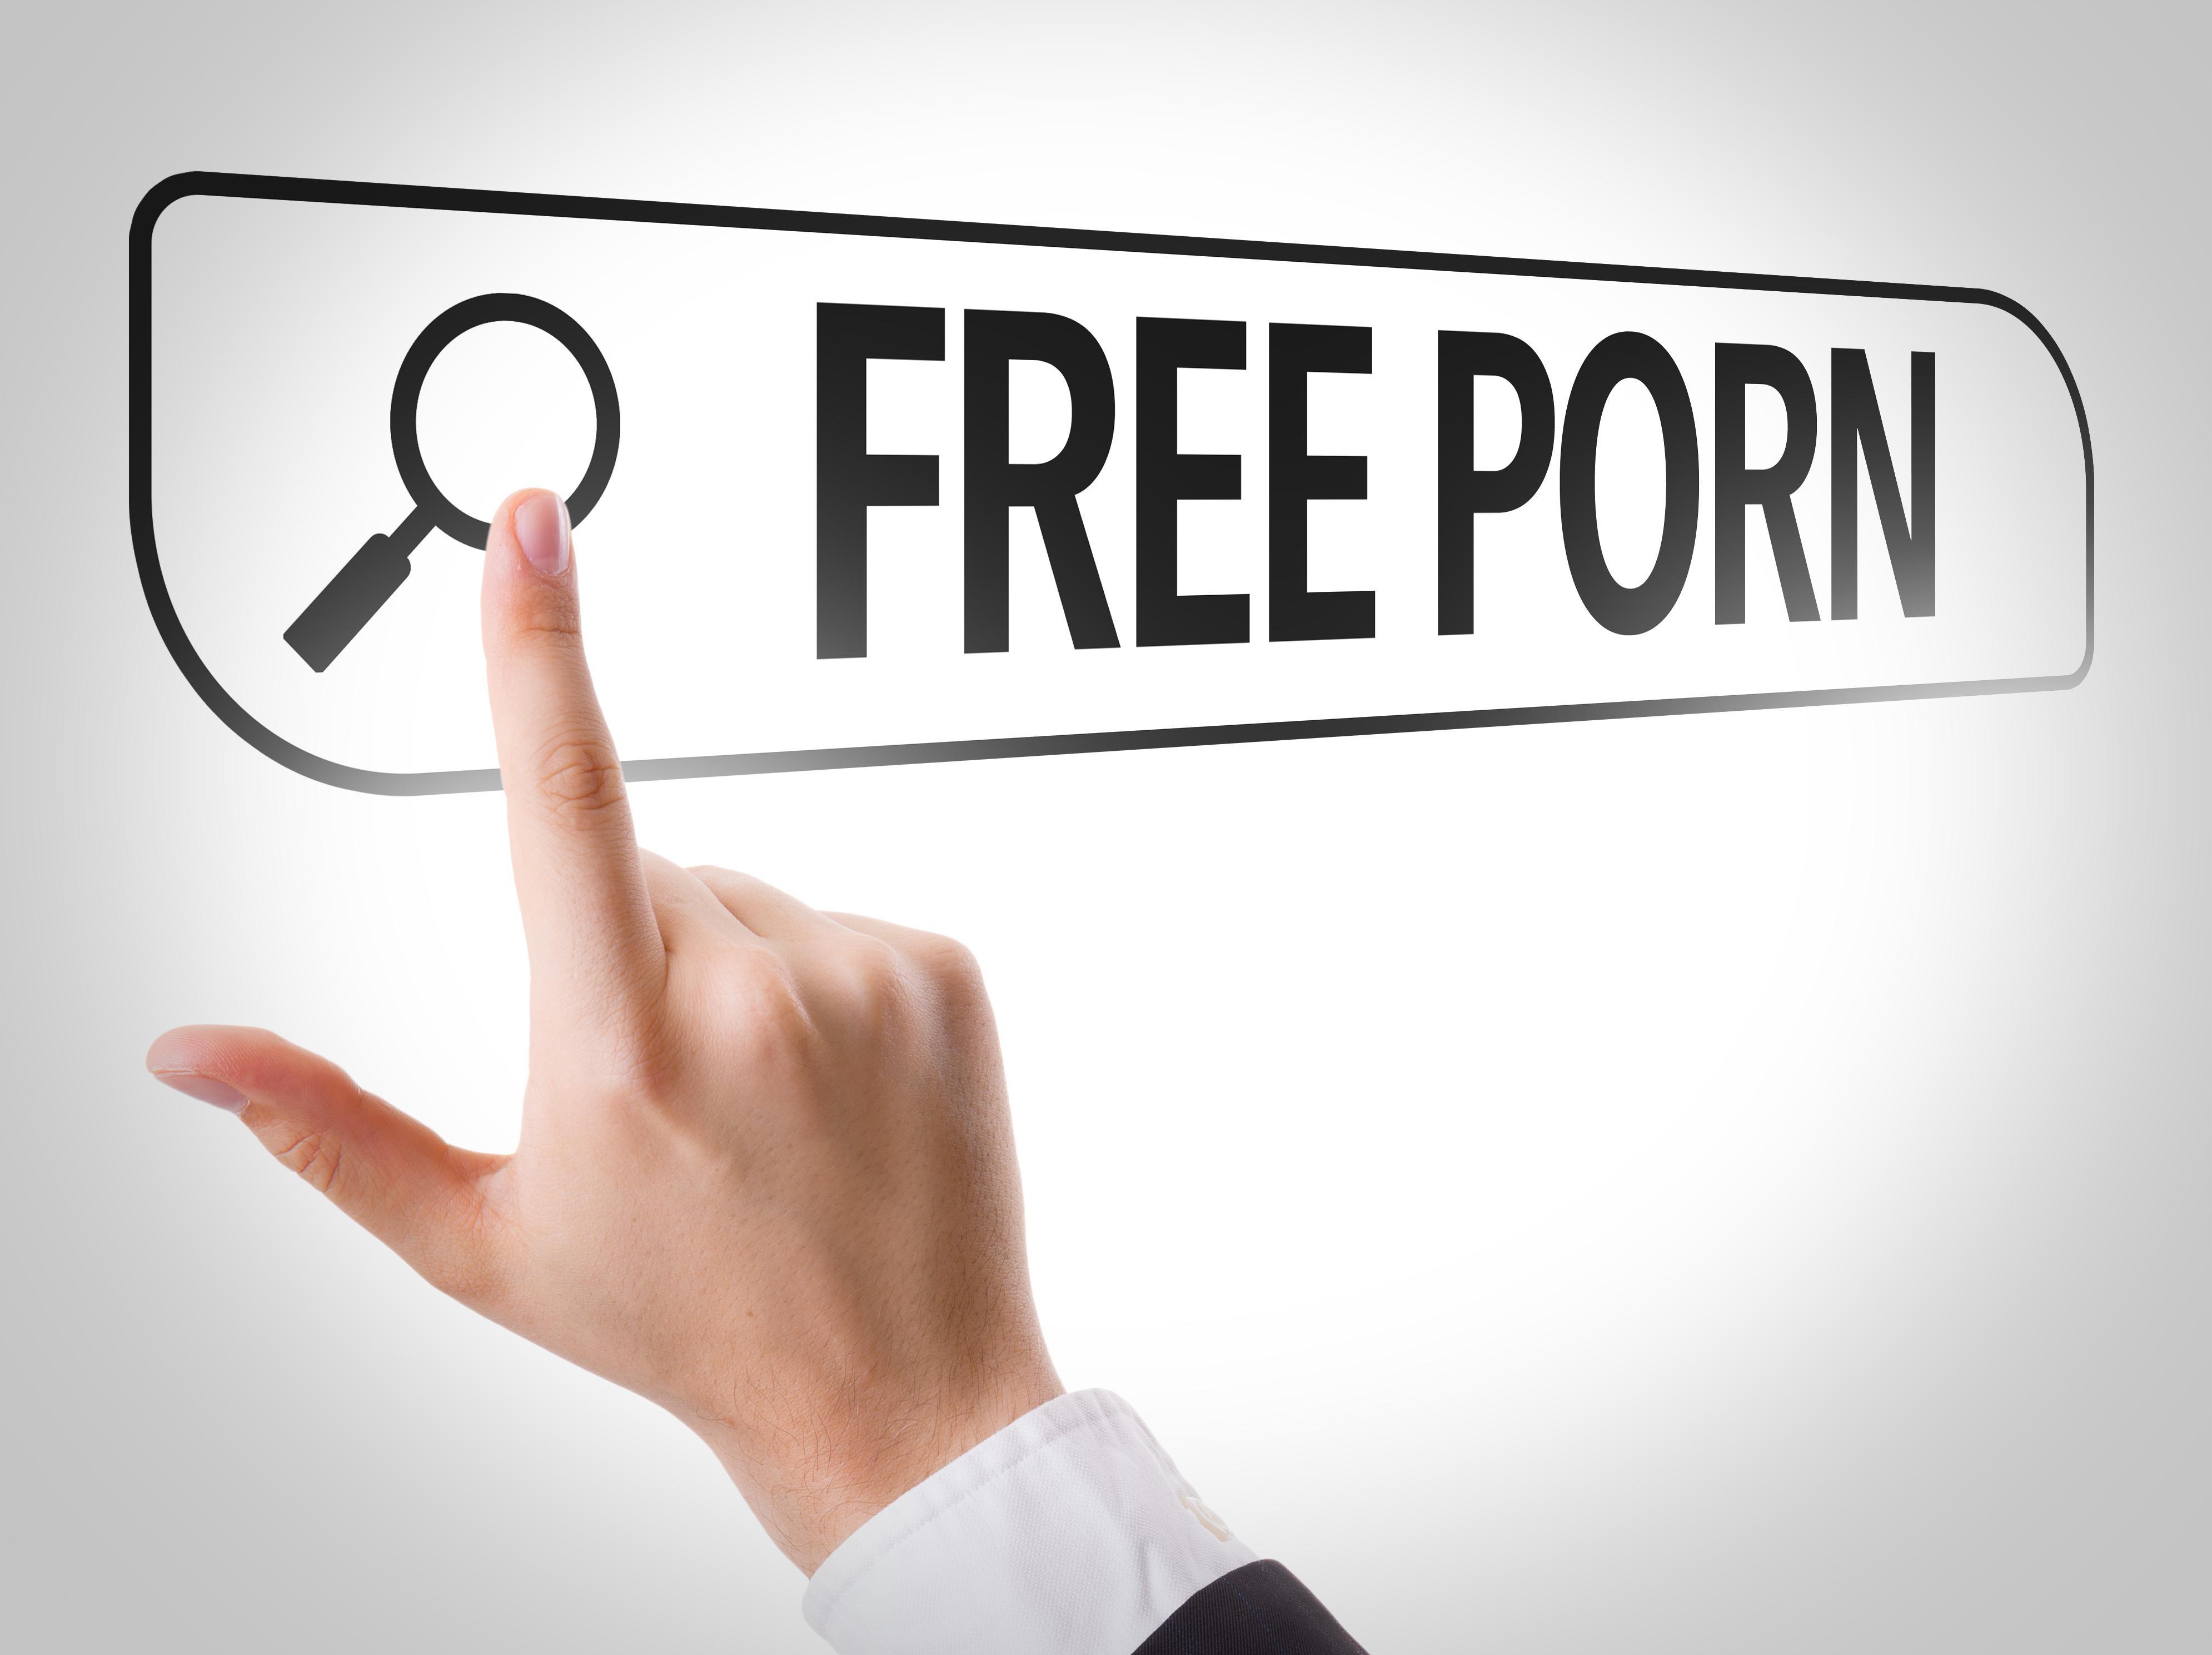 Free hardcore porn sites